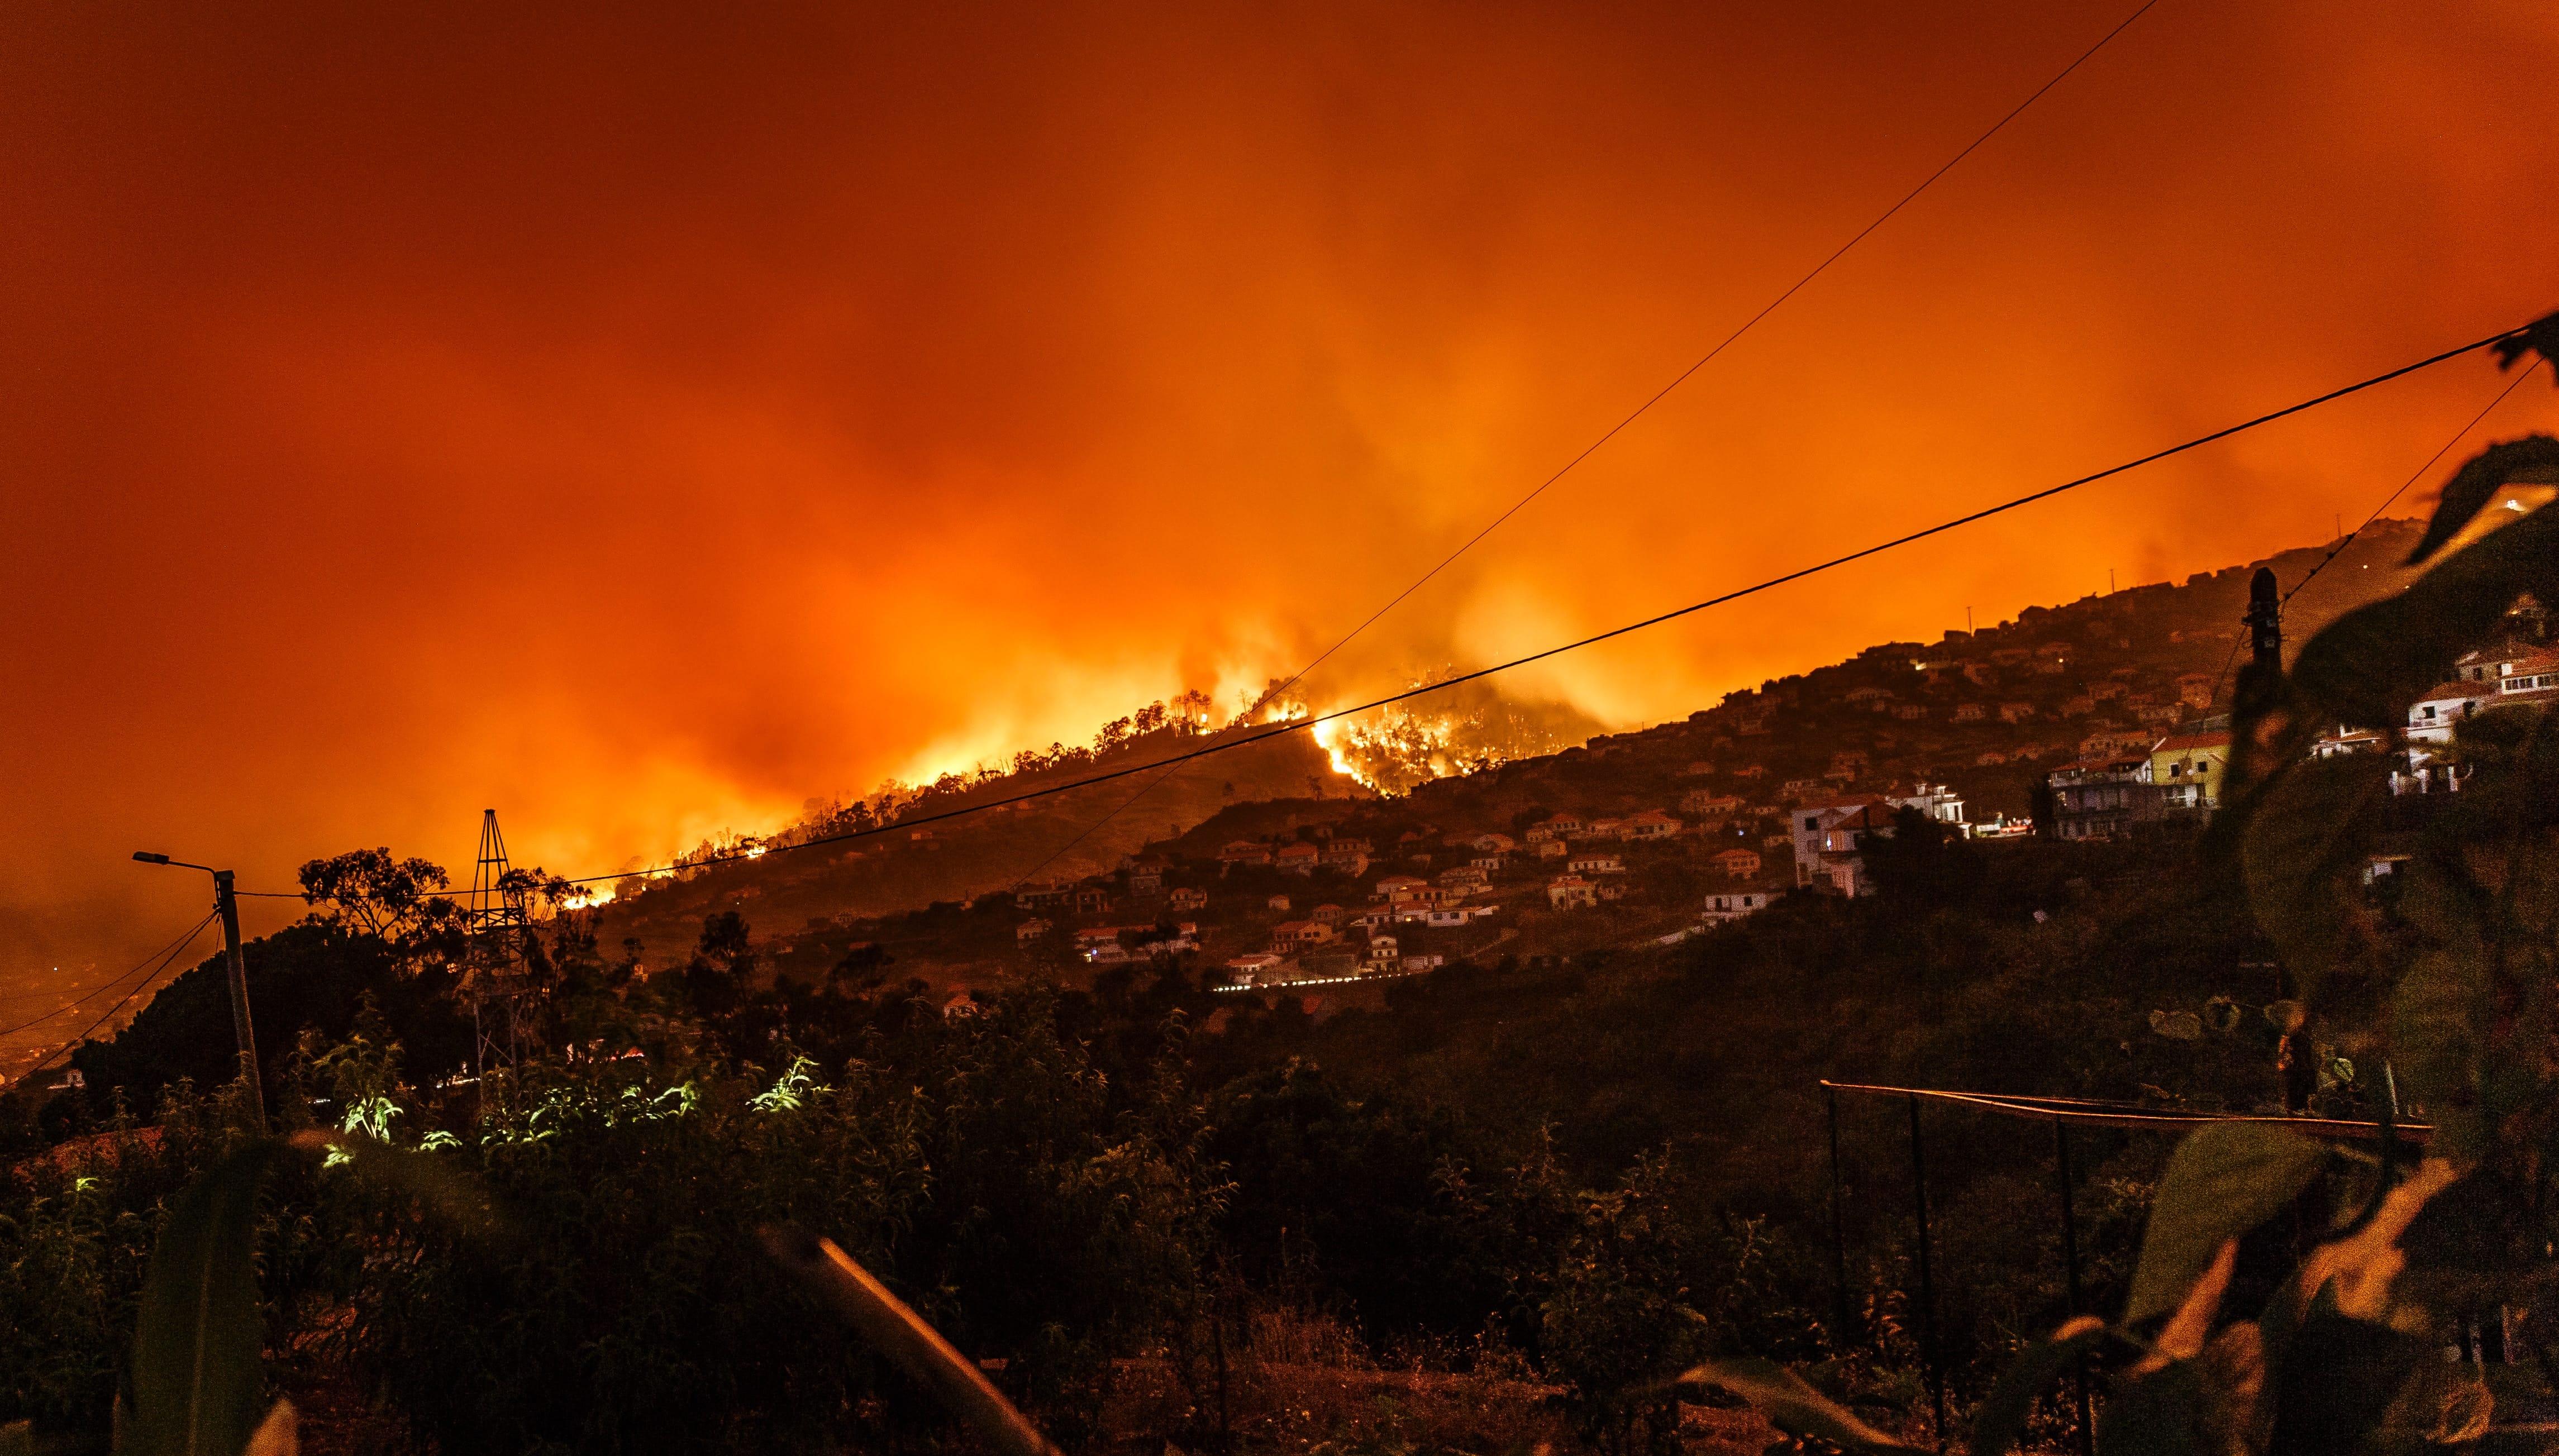 California Wildfire Preparedness: Pre-Evacuation Checklist - Fraker Fire